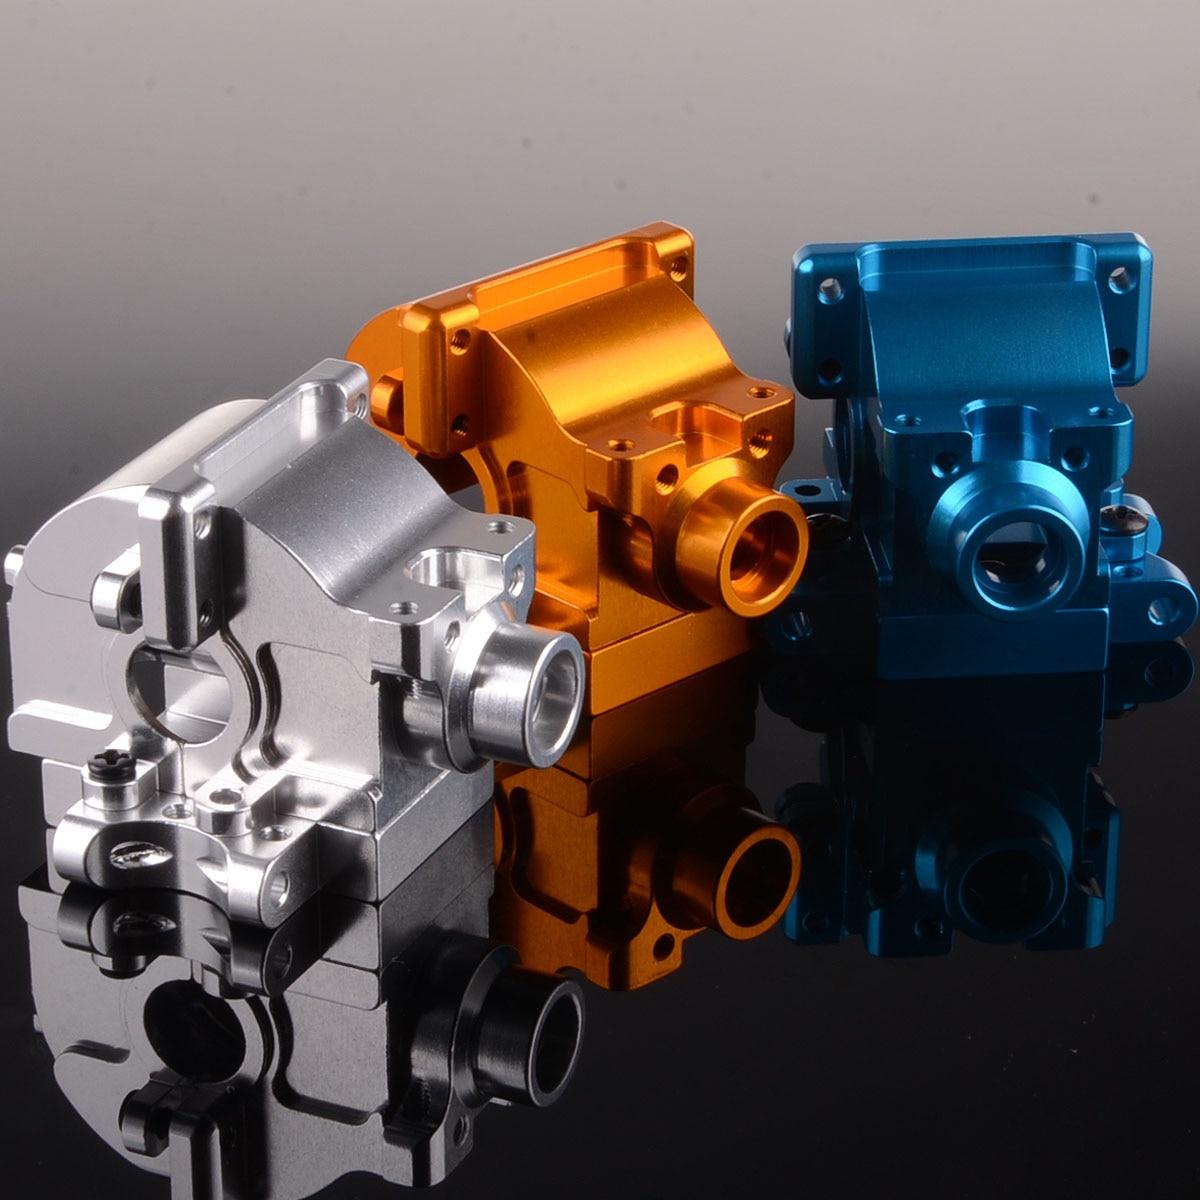 122275 Gear Box RC 1/10 HSP Nitro Buggy Truck Monster Car 94122 94188 - ألعاب التحكم عن بعد